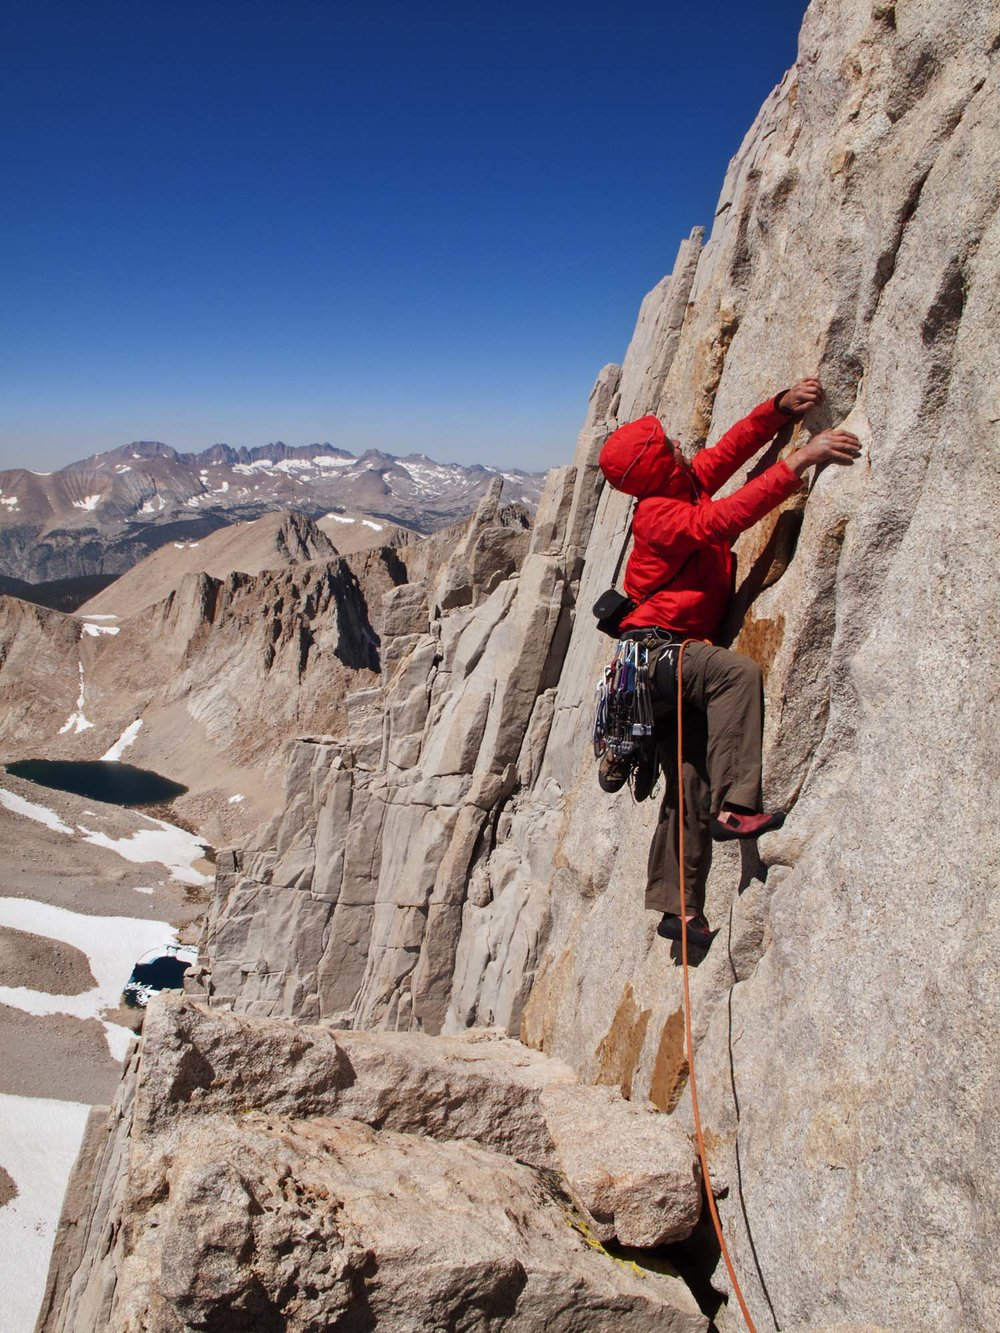 Climber on Fishhook Arete